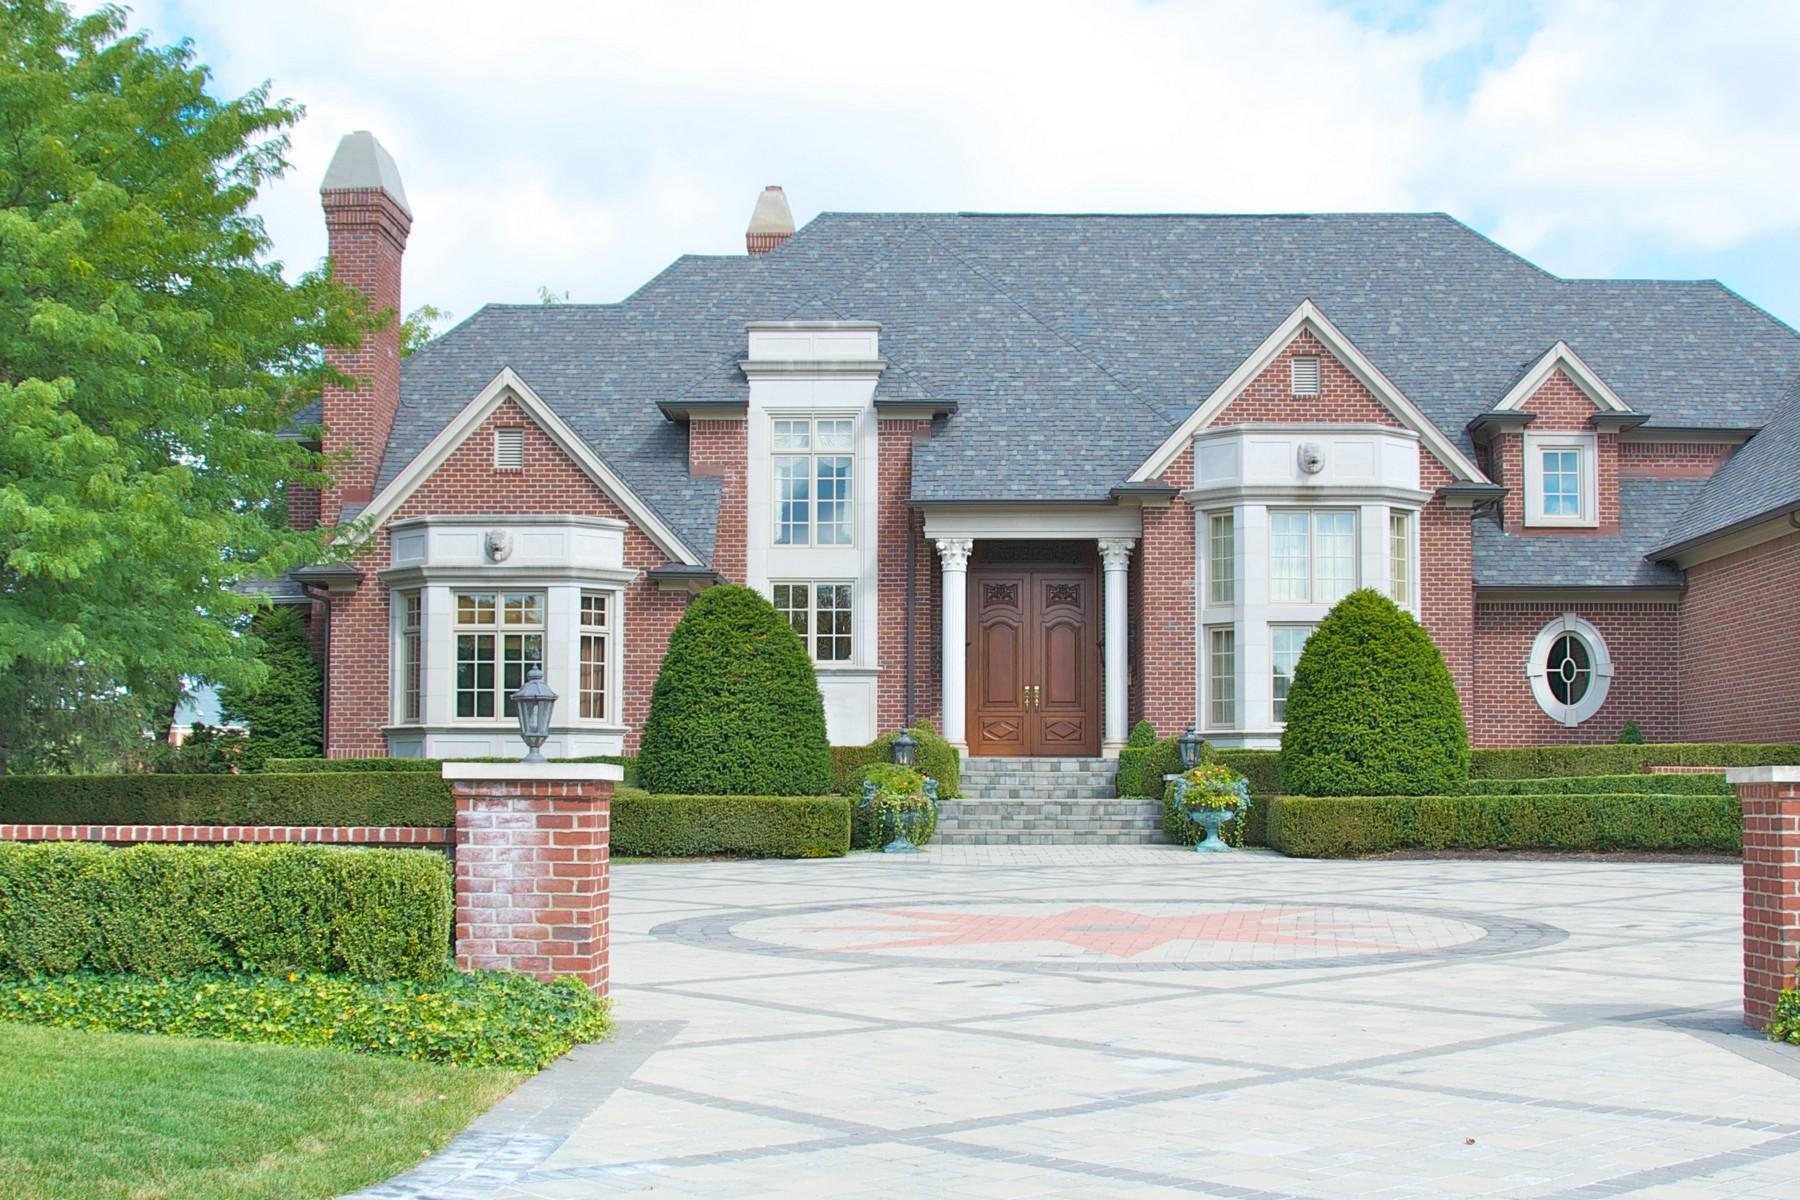 独户住宅 为 销售 在 Exclusive Bridlebourne 3510 Sedgemoor Circle 卡梅尔, 印第安纳州, 46032 美国